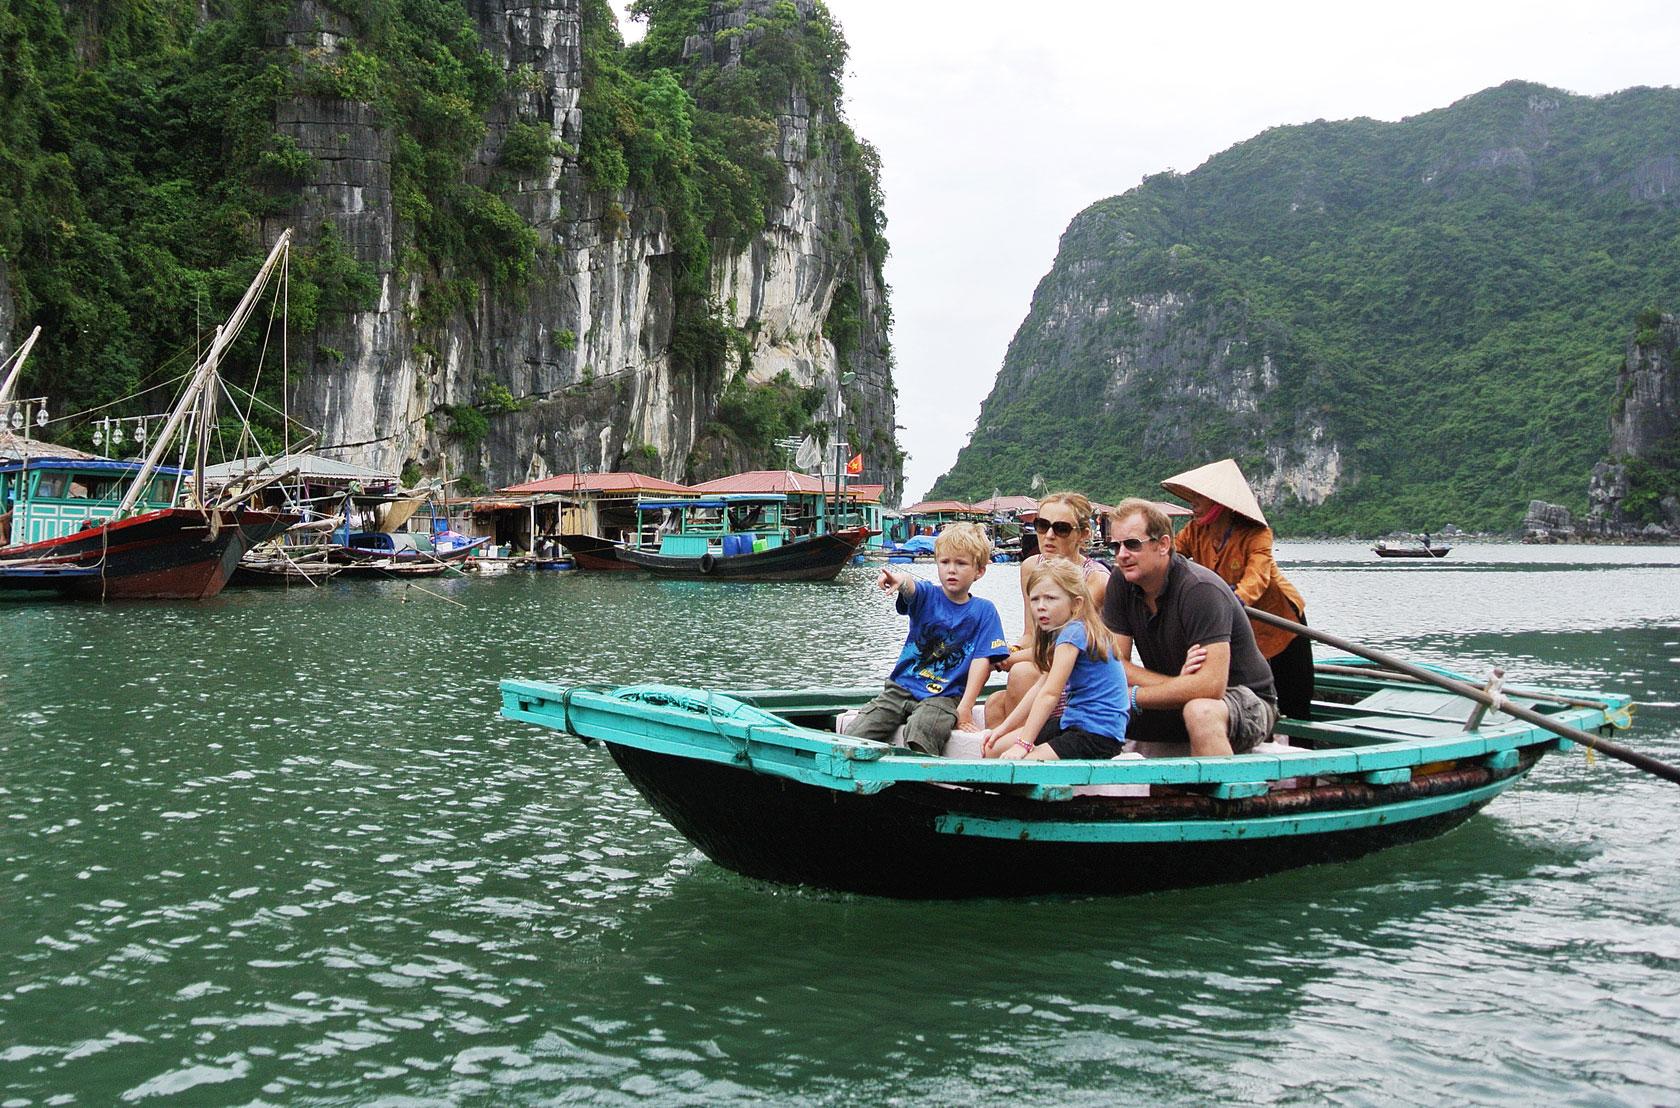 Visiting Cua Van Floating Village by boat